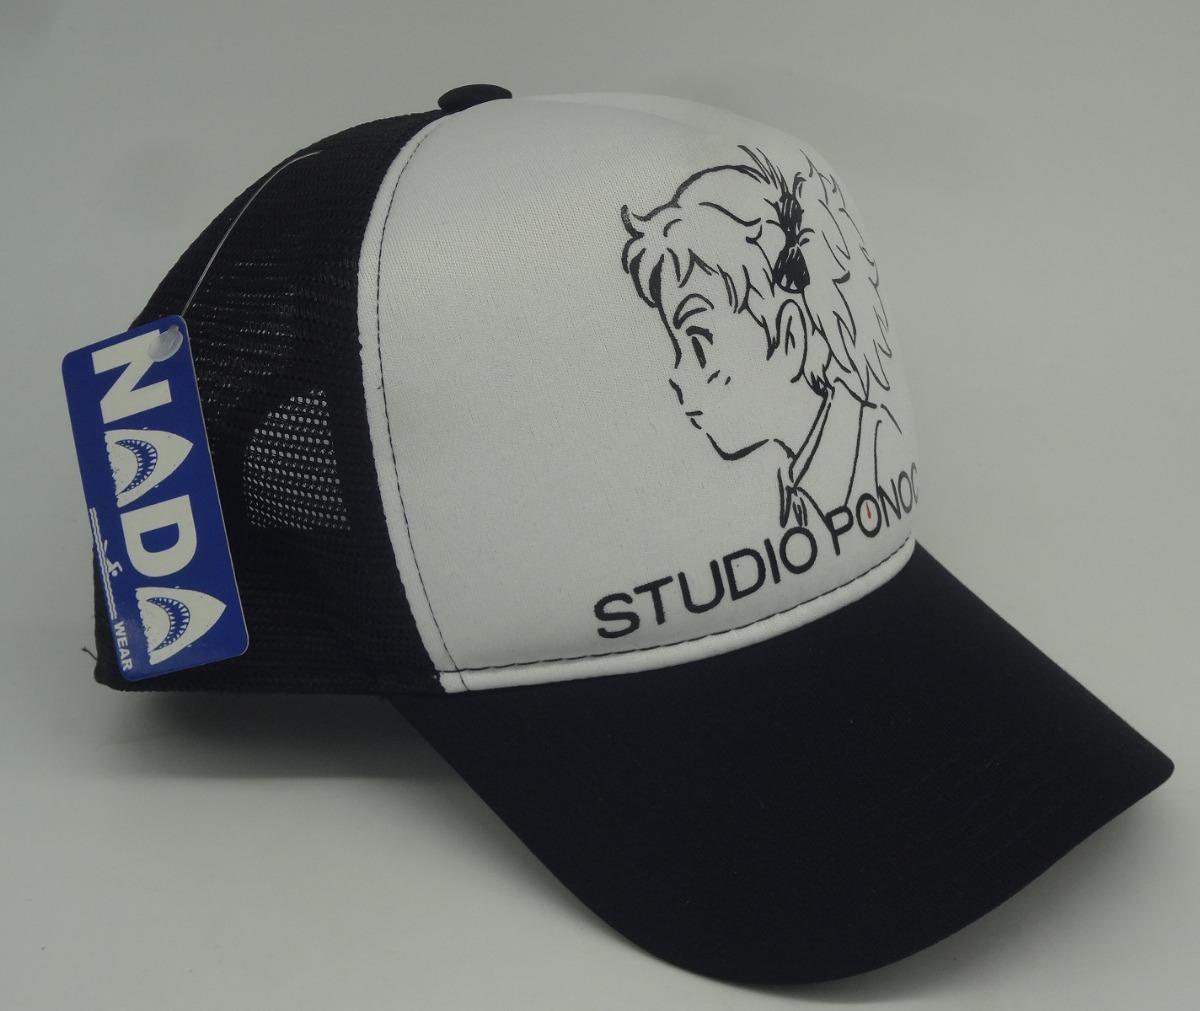 Boné Trucker Cap Studio Ponoc Anime Geek Otaku - R  46 4406bfe2b07